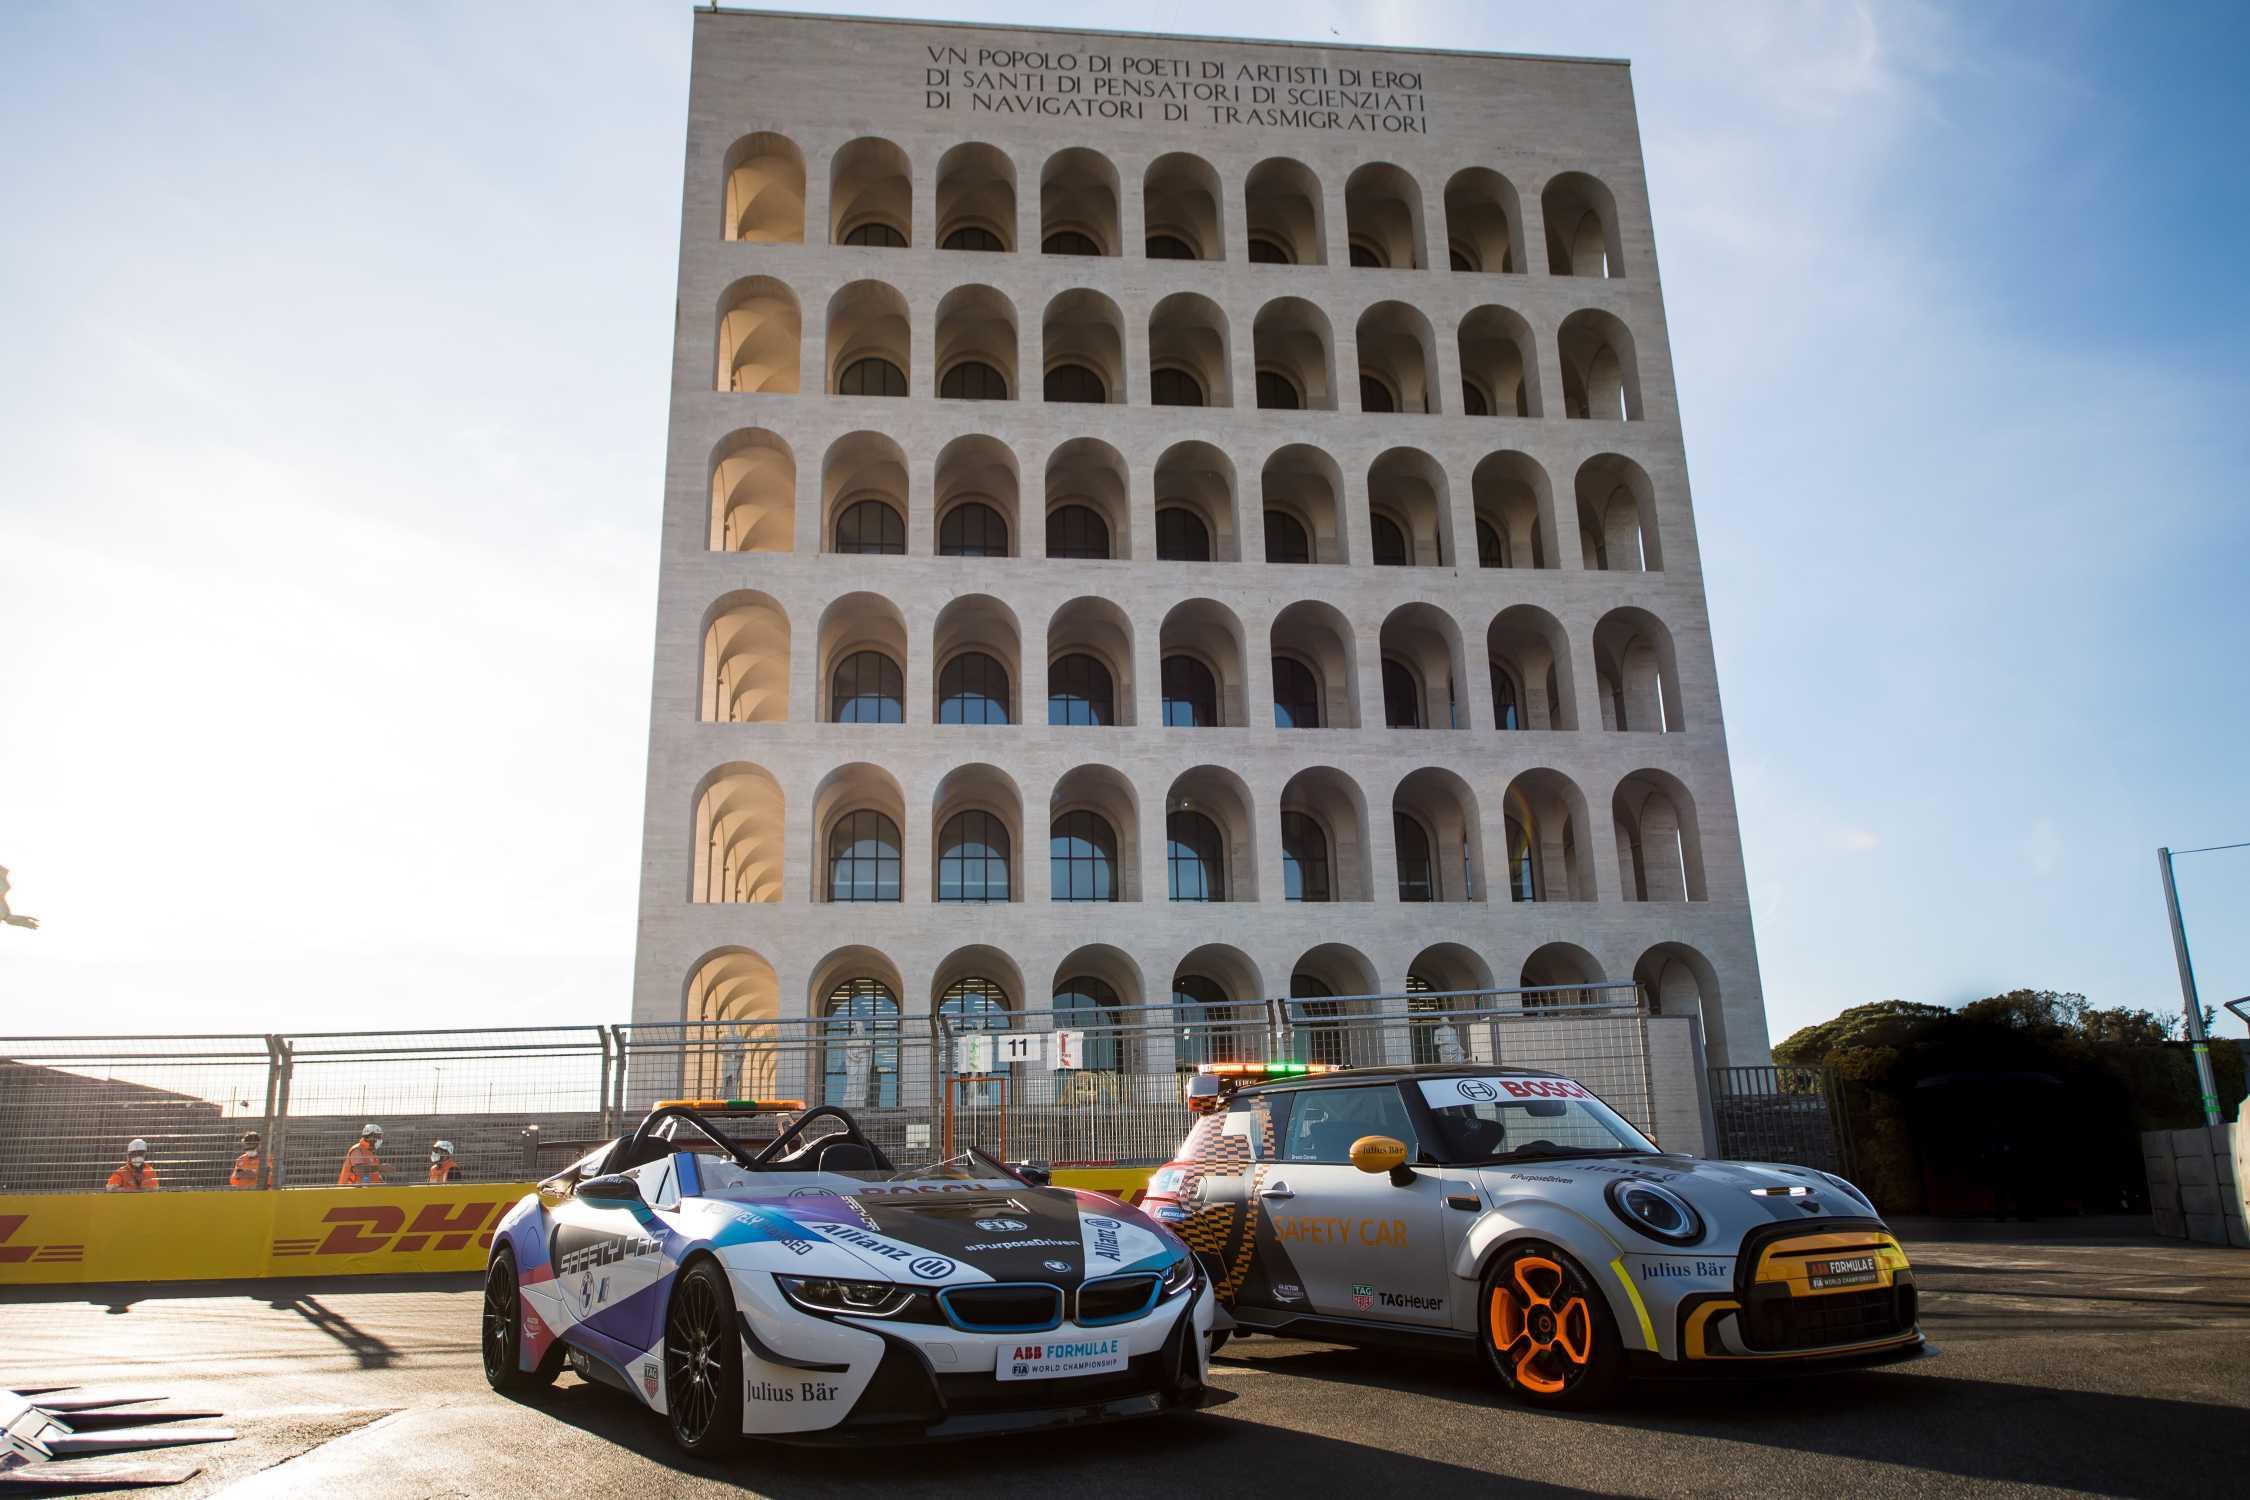 Rome (ITA), 8th April - 11th April 2021. ABB FIA Formula E World Championship, Season 7, Rome E-Prix, MINI Electric Pacesetter inspired by JCW, Safety Car, BMW i8 Roadster Safety Car.